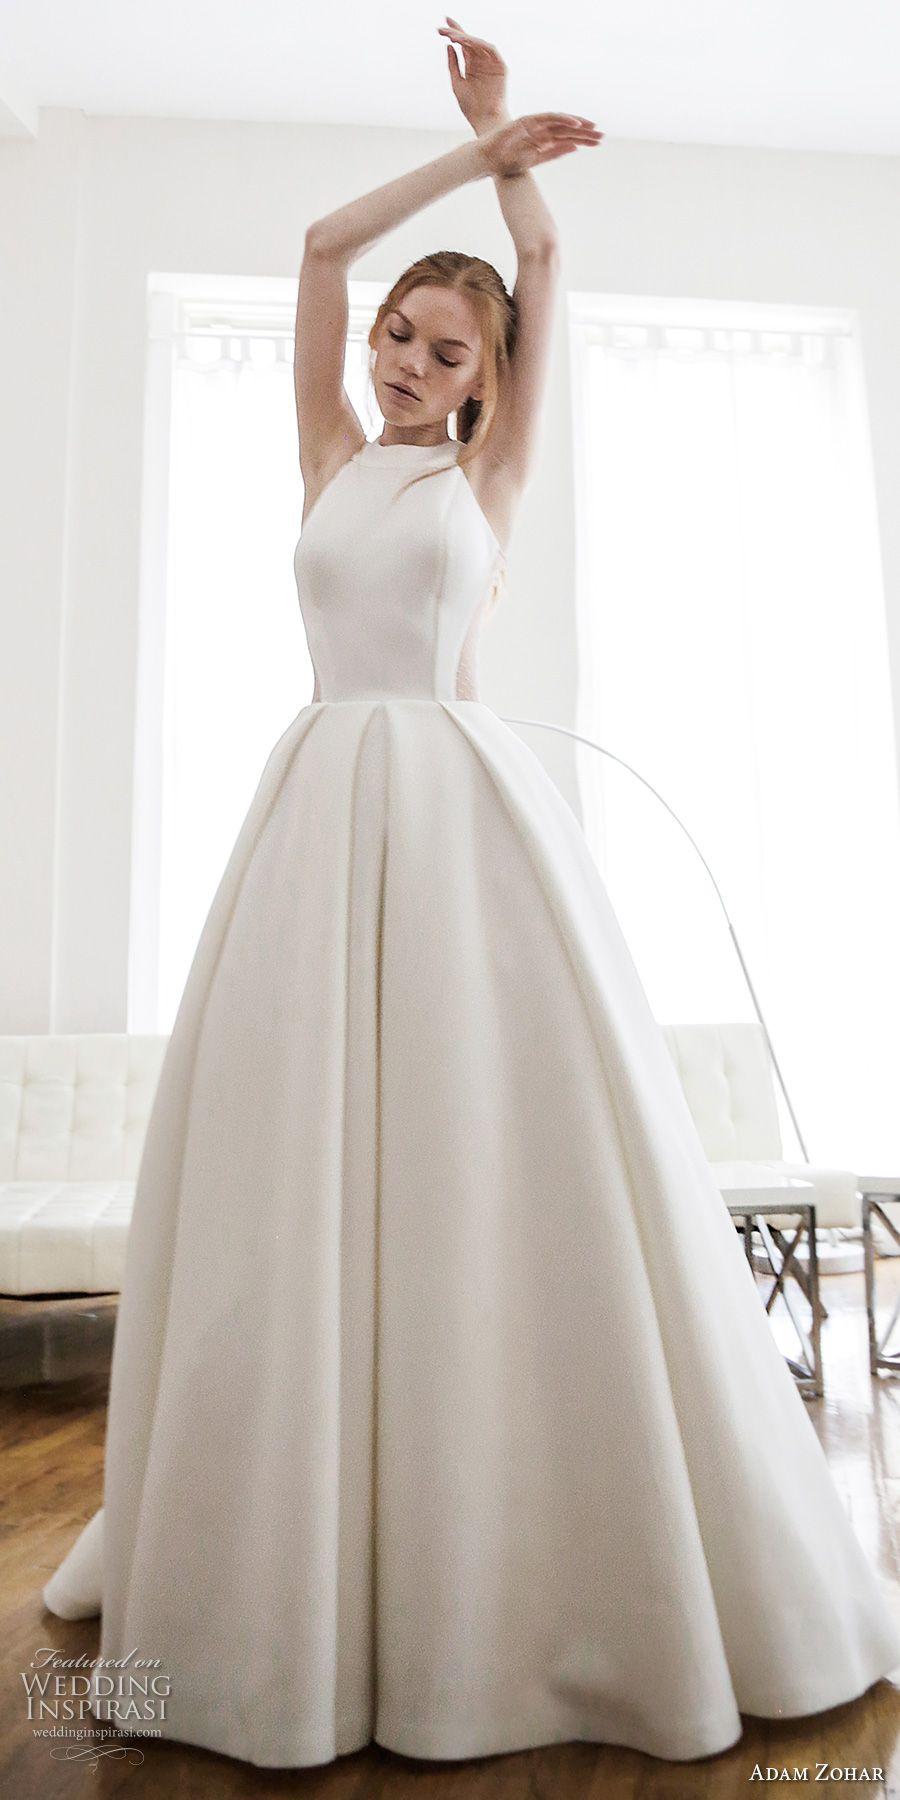 Adam zohar bridal sleeveless halter neck simple clean classic